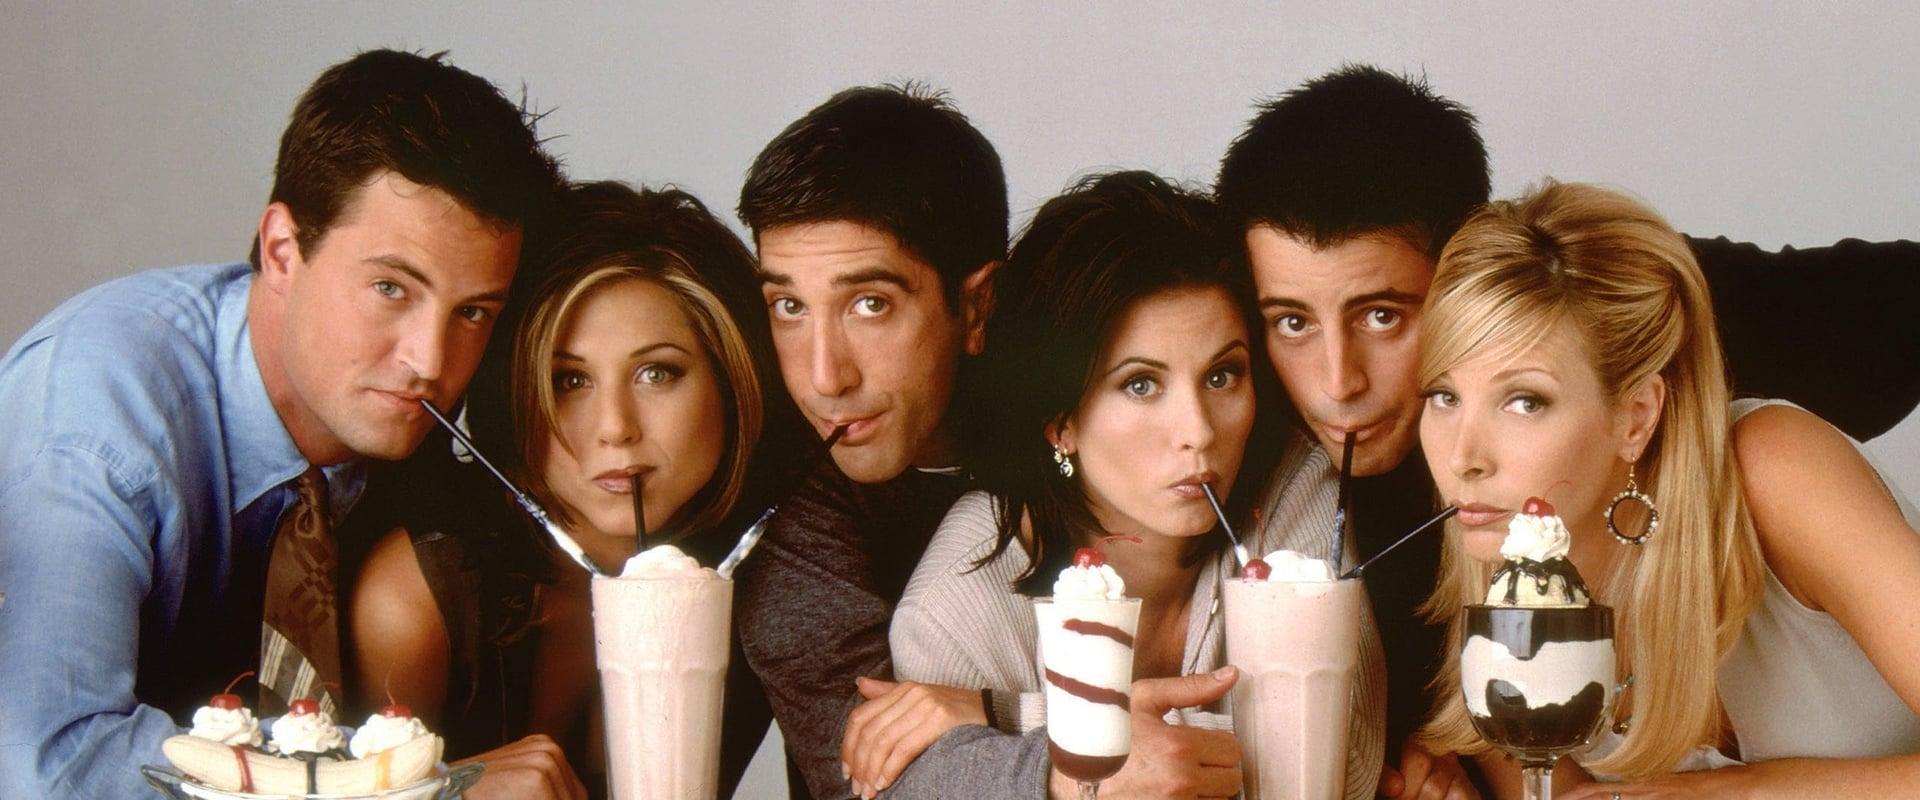 Friends 123Movies Watch Online all seasons of Friends